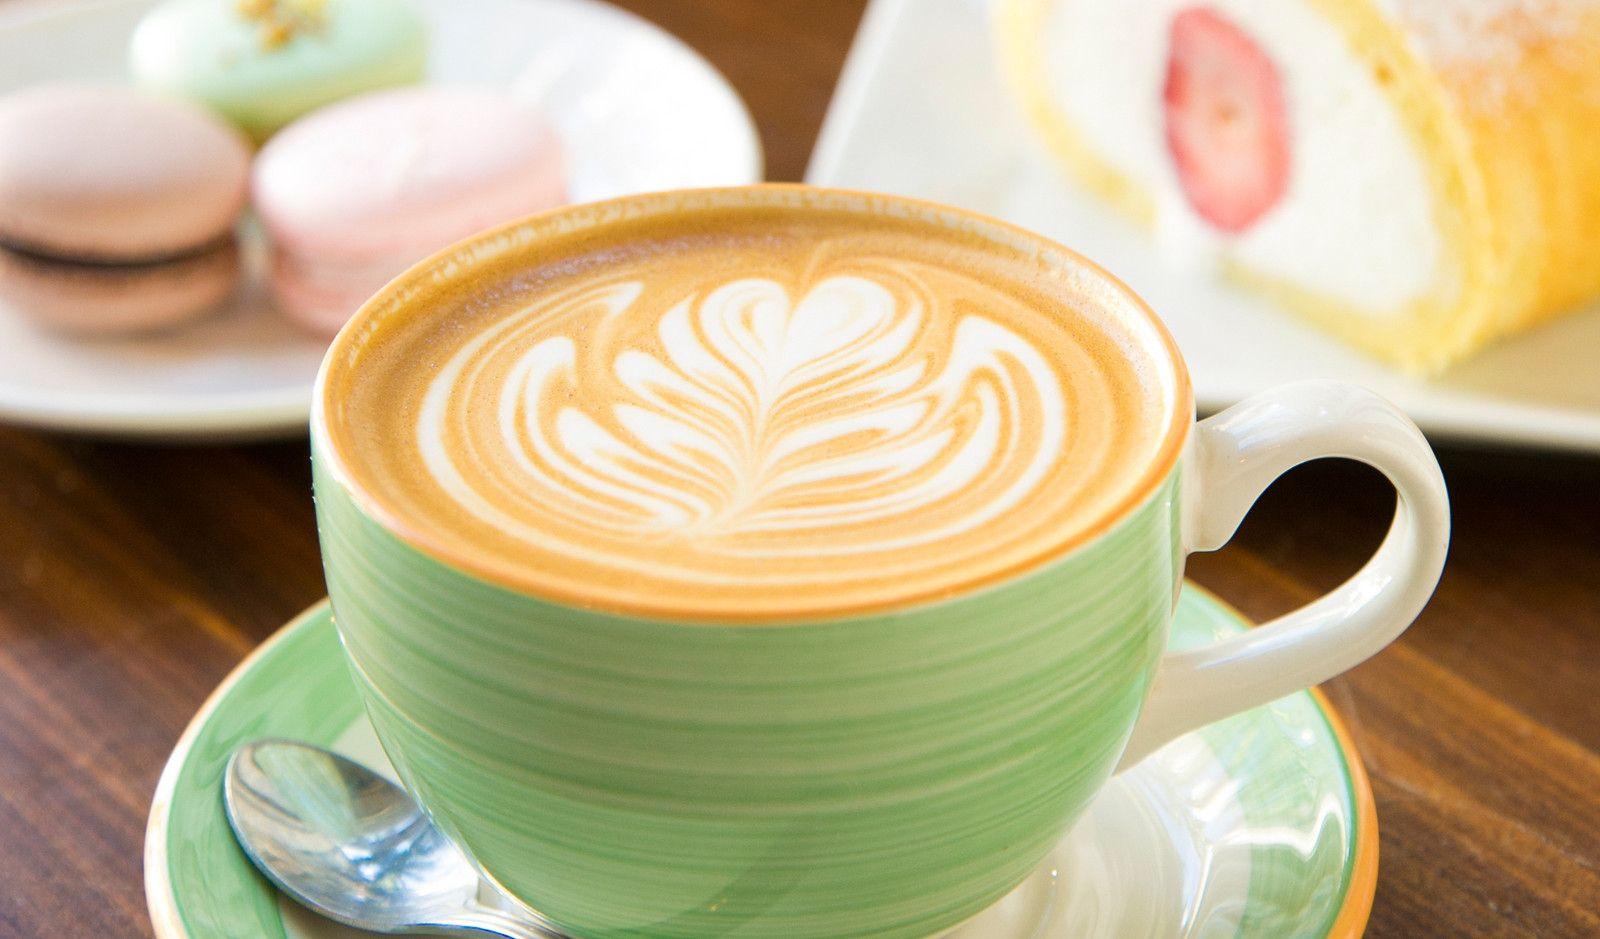 Best kona coffee worldclass kona coffee honolulu